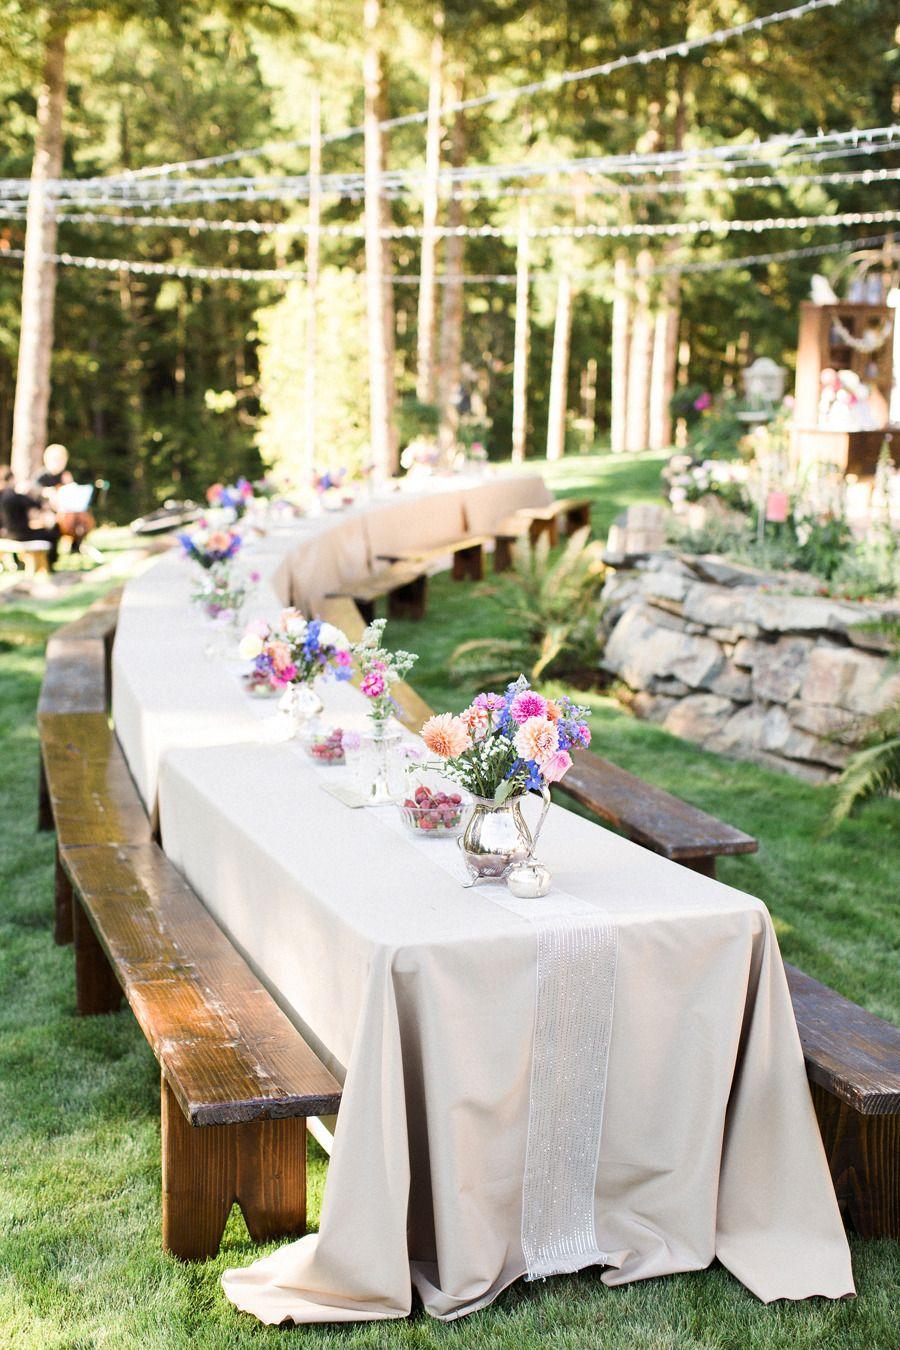 DIY Backyard Oregon Wedding | Cozy backyard, Backyard and Cozy